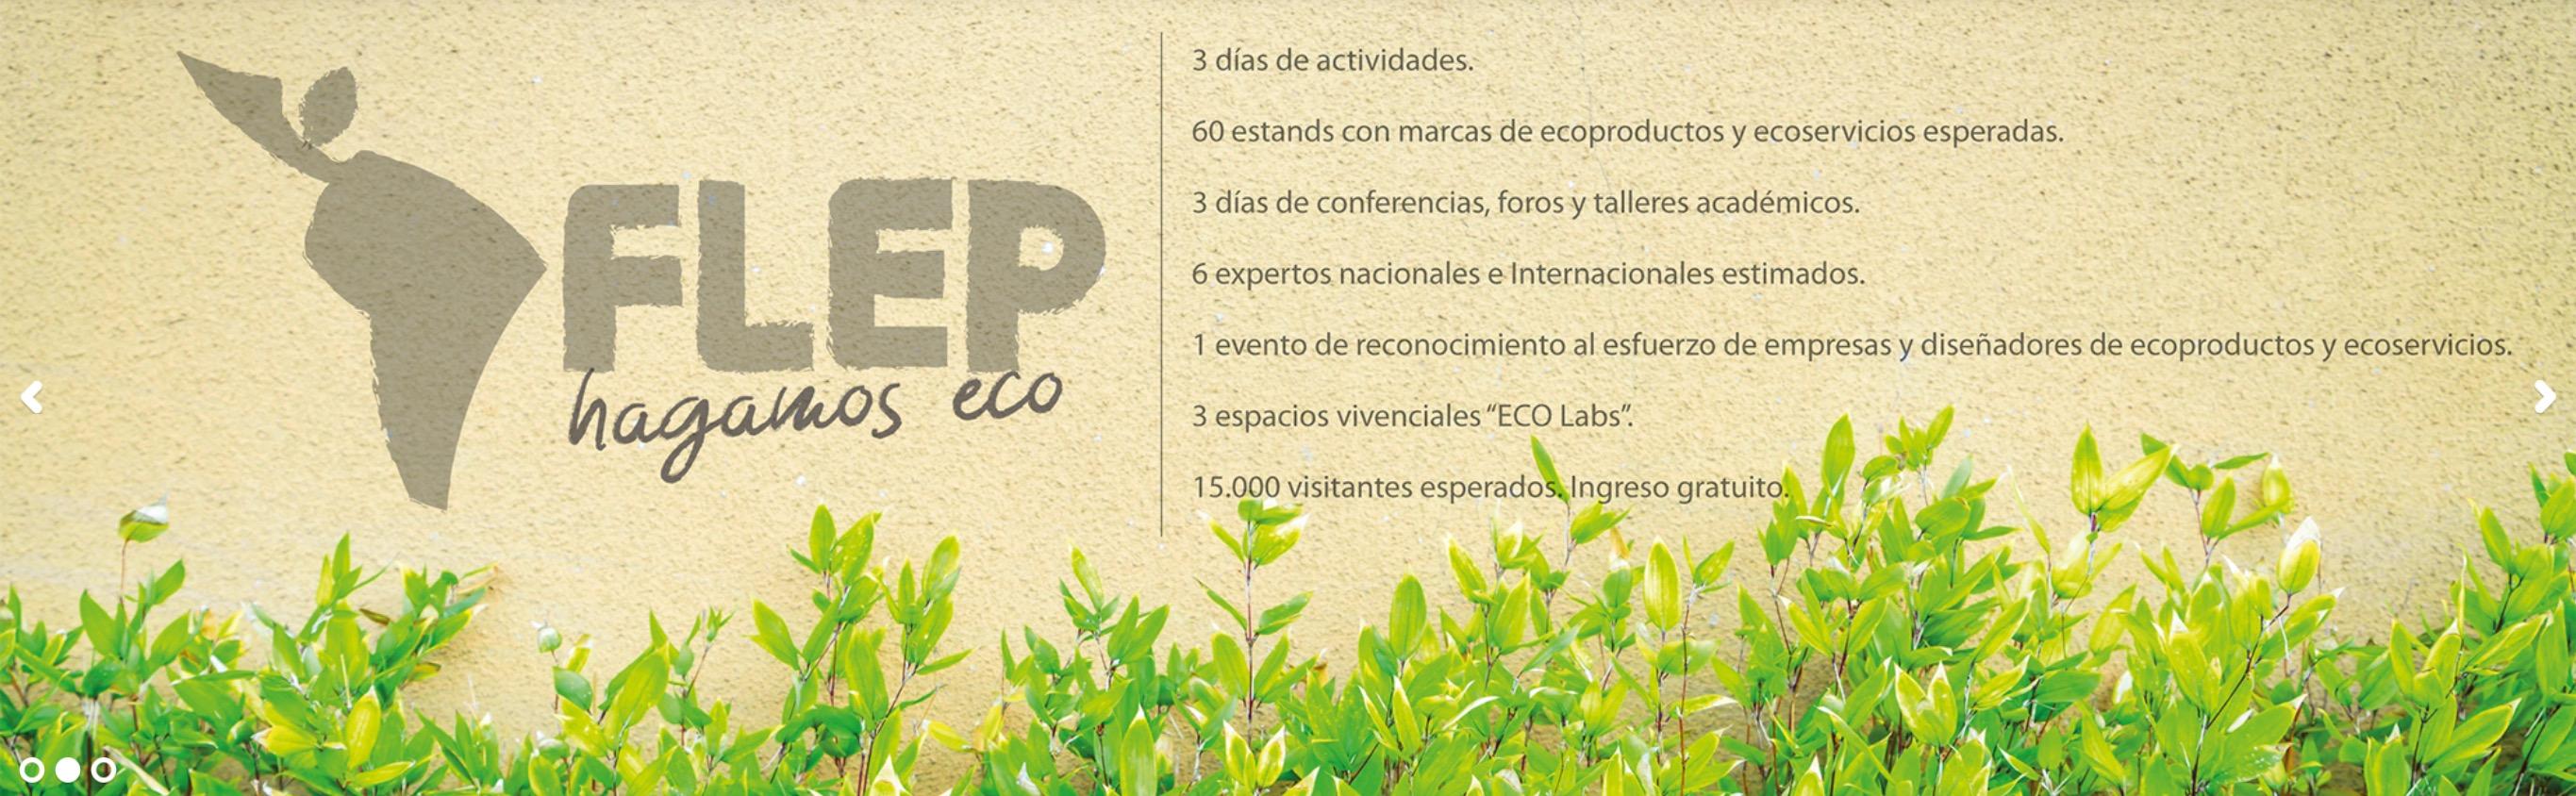 Medellin Ecofair